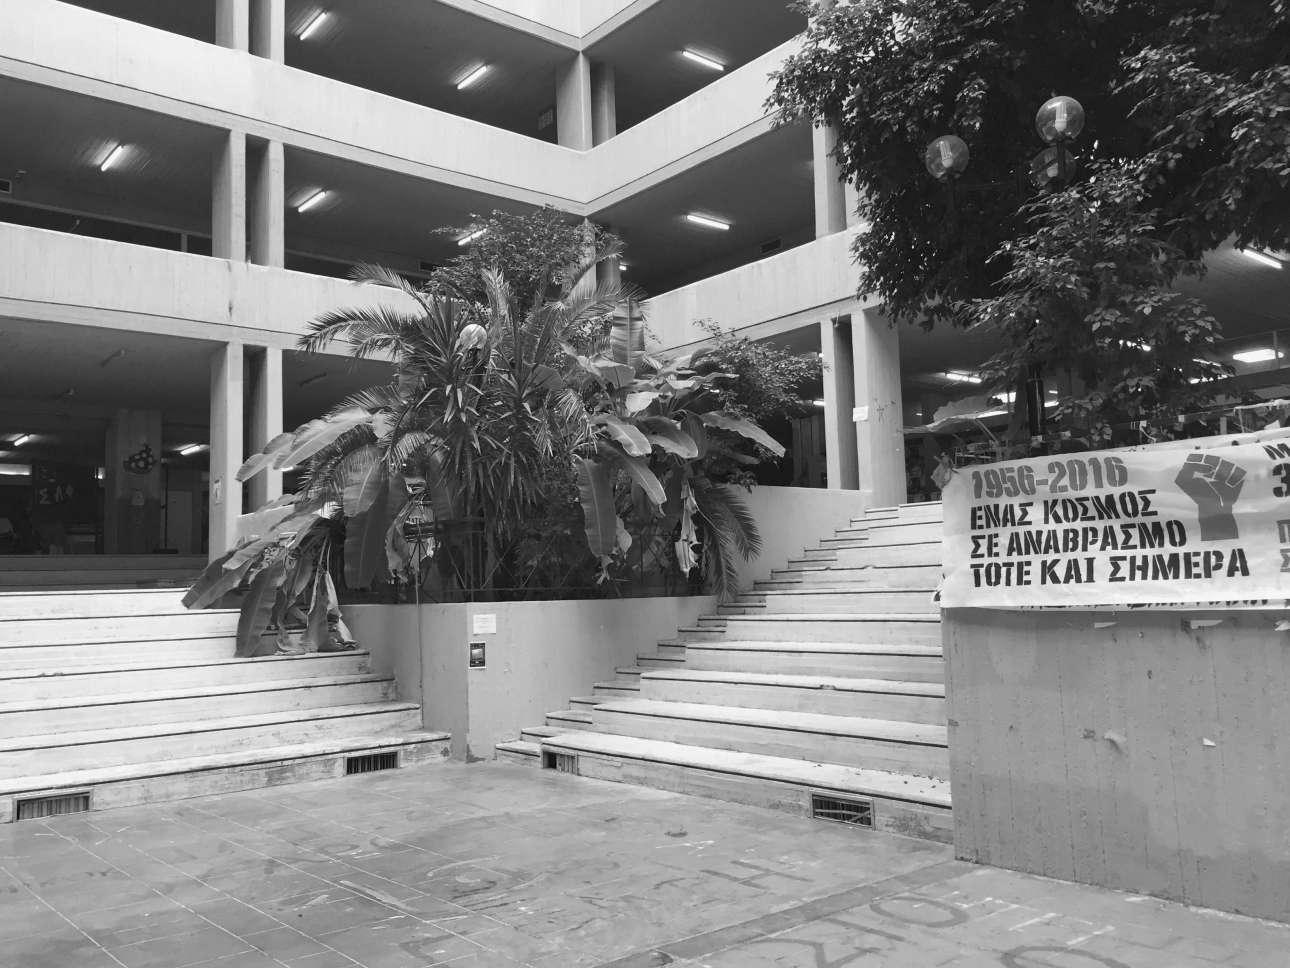 Philosophy School - Kapodistrian University of Athens - Image by Neiheiser Argyros